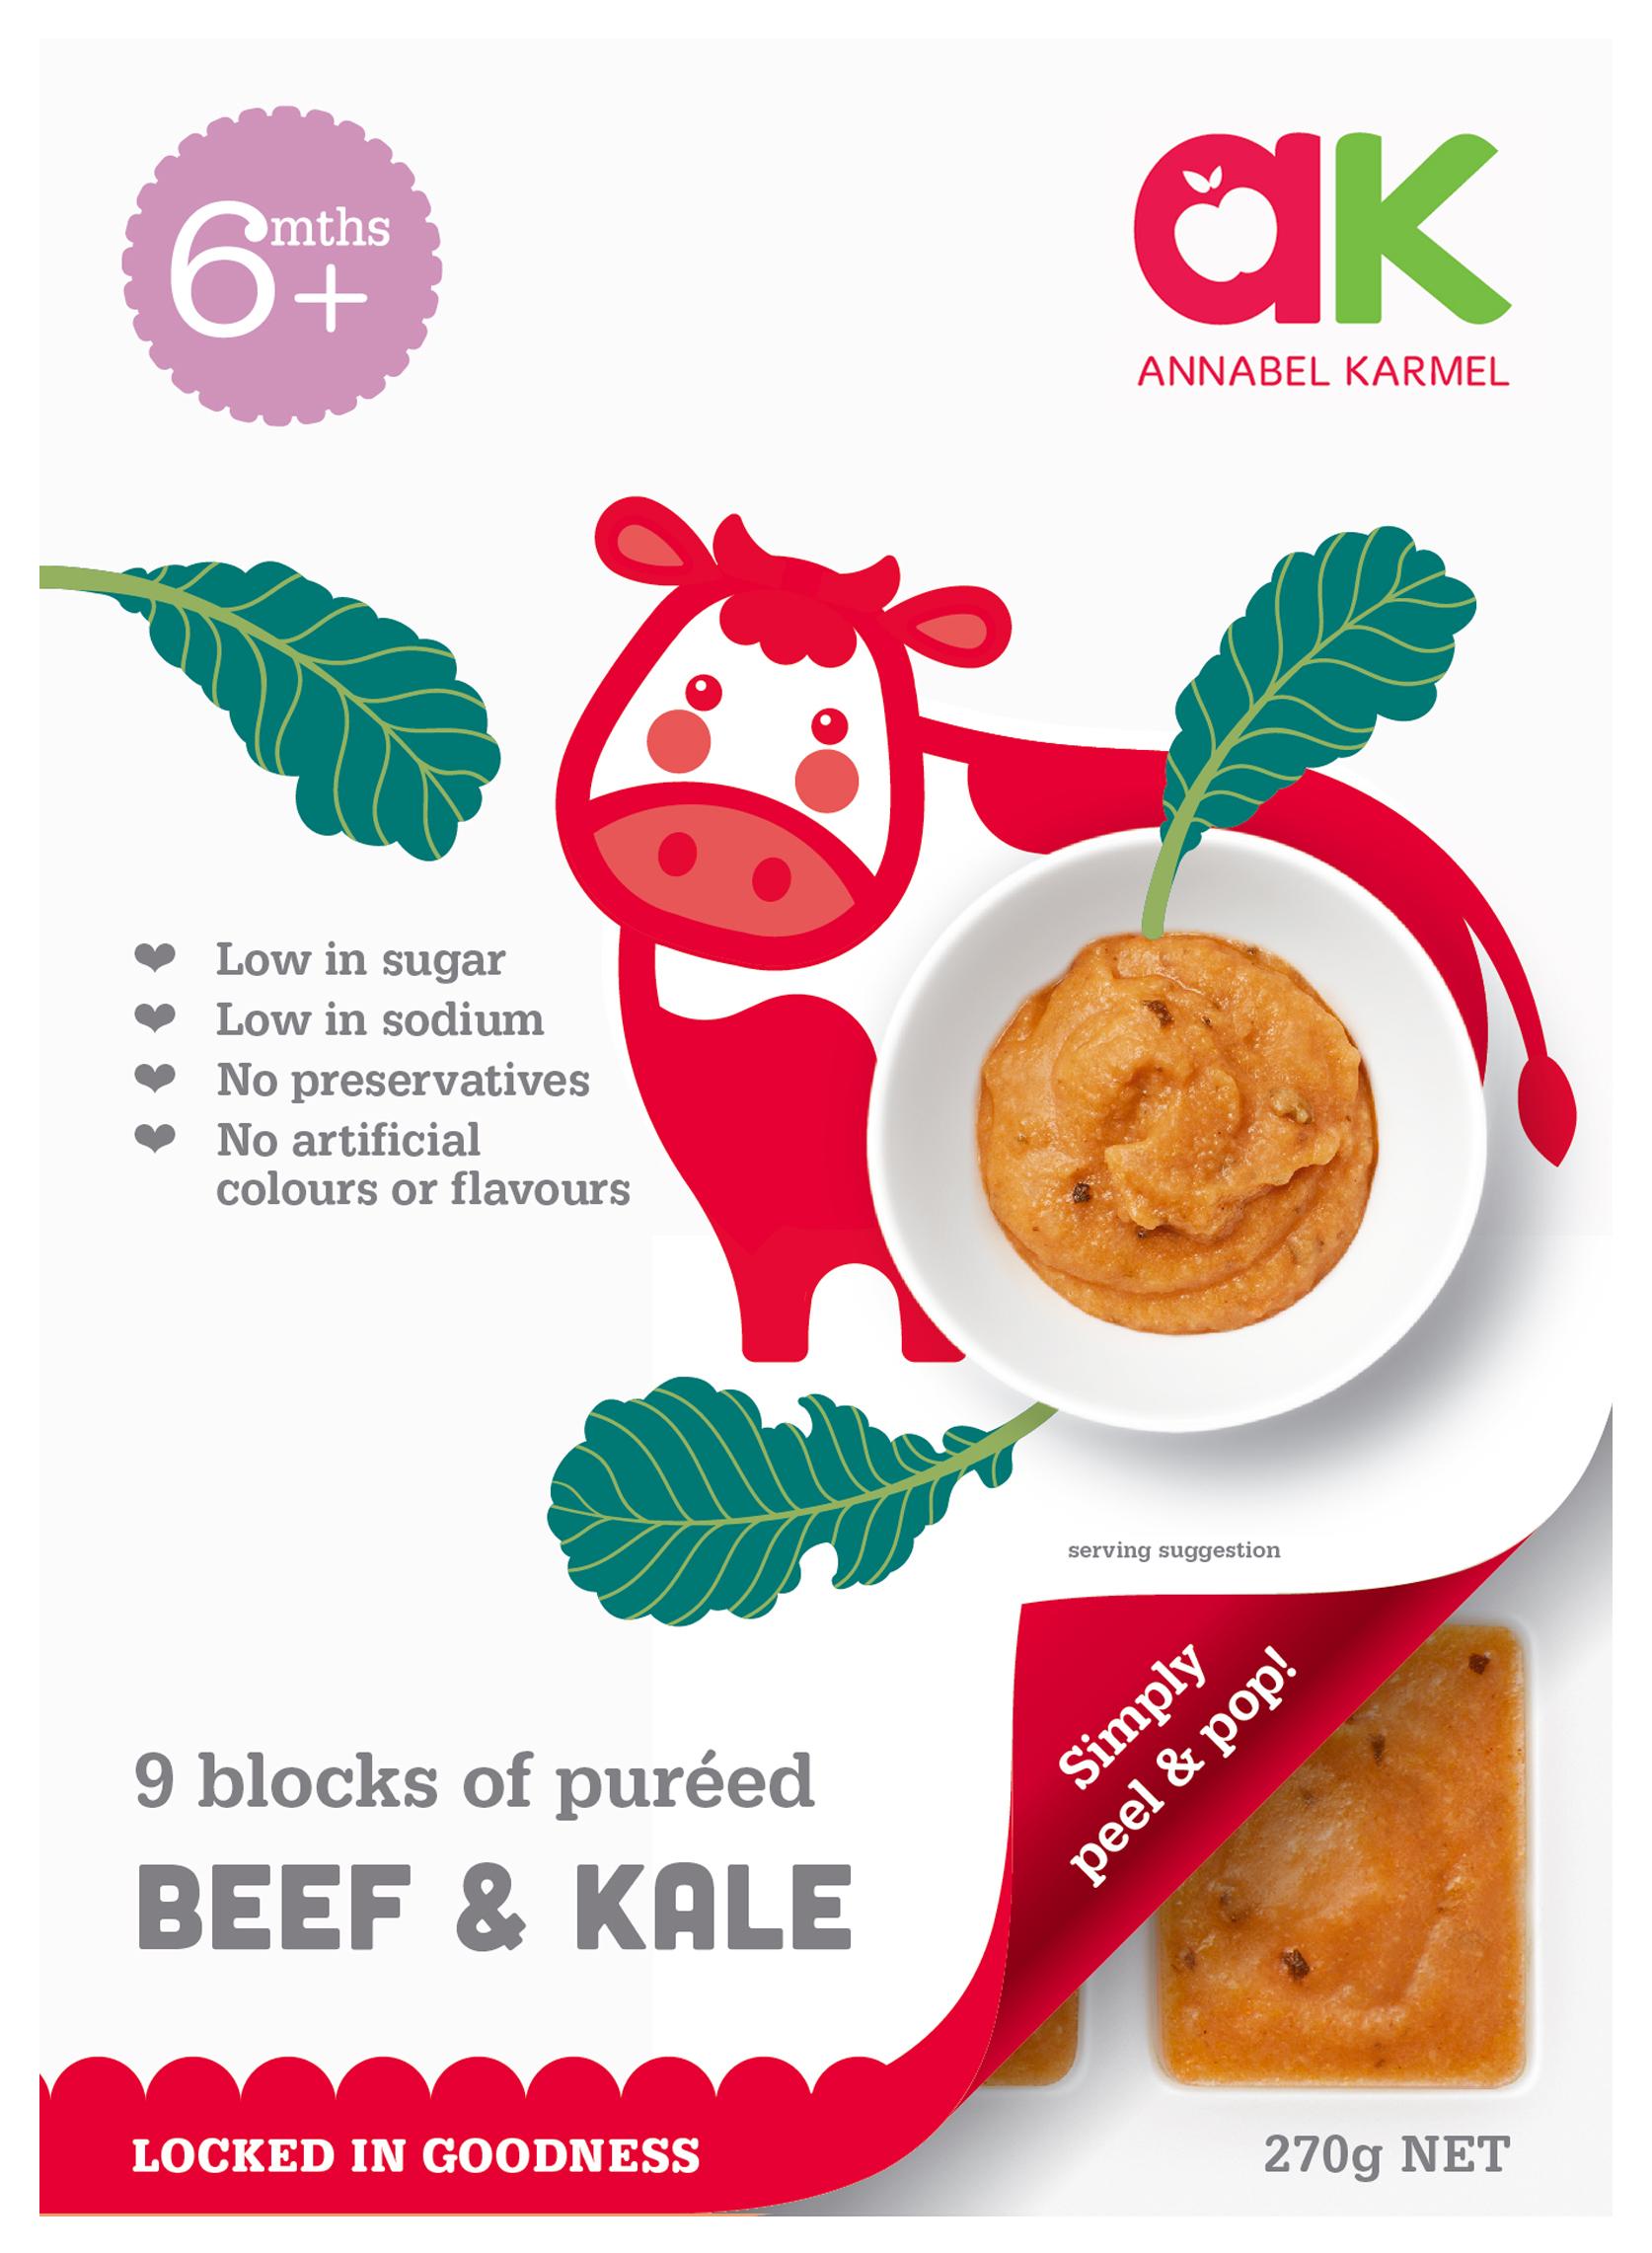 Beef with Kale Vegetables Stage 2 Annabel Karmel